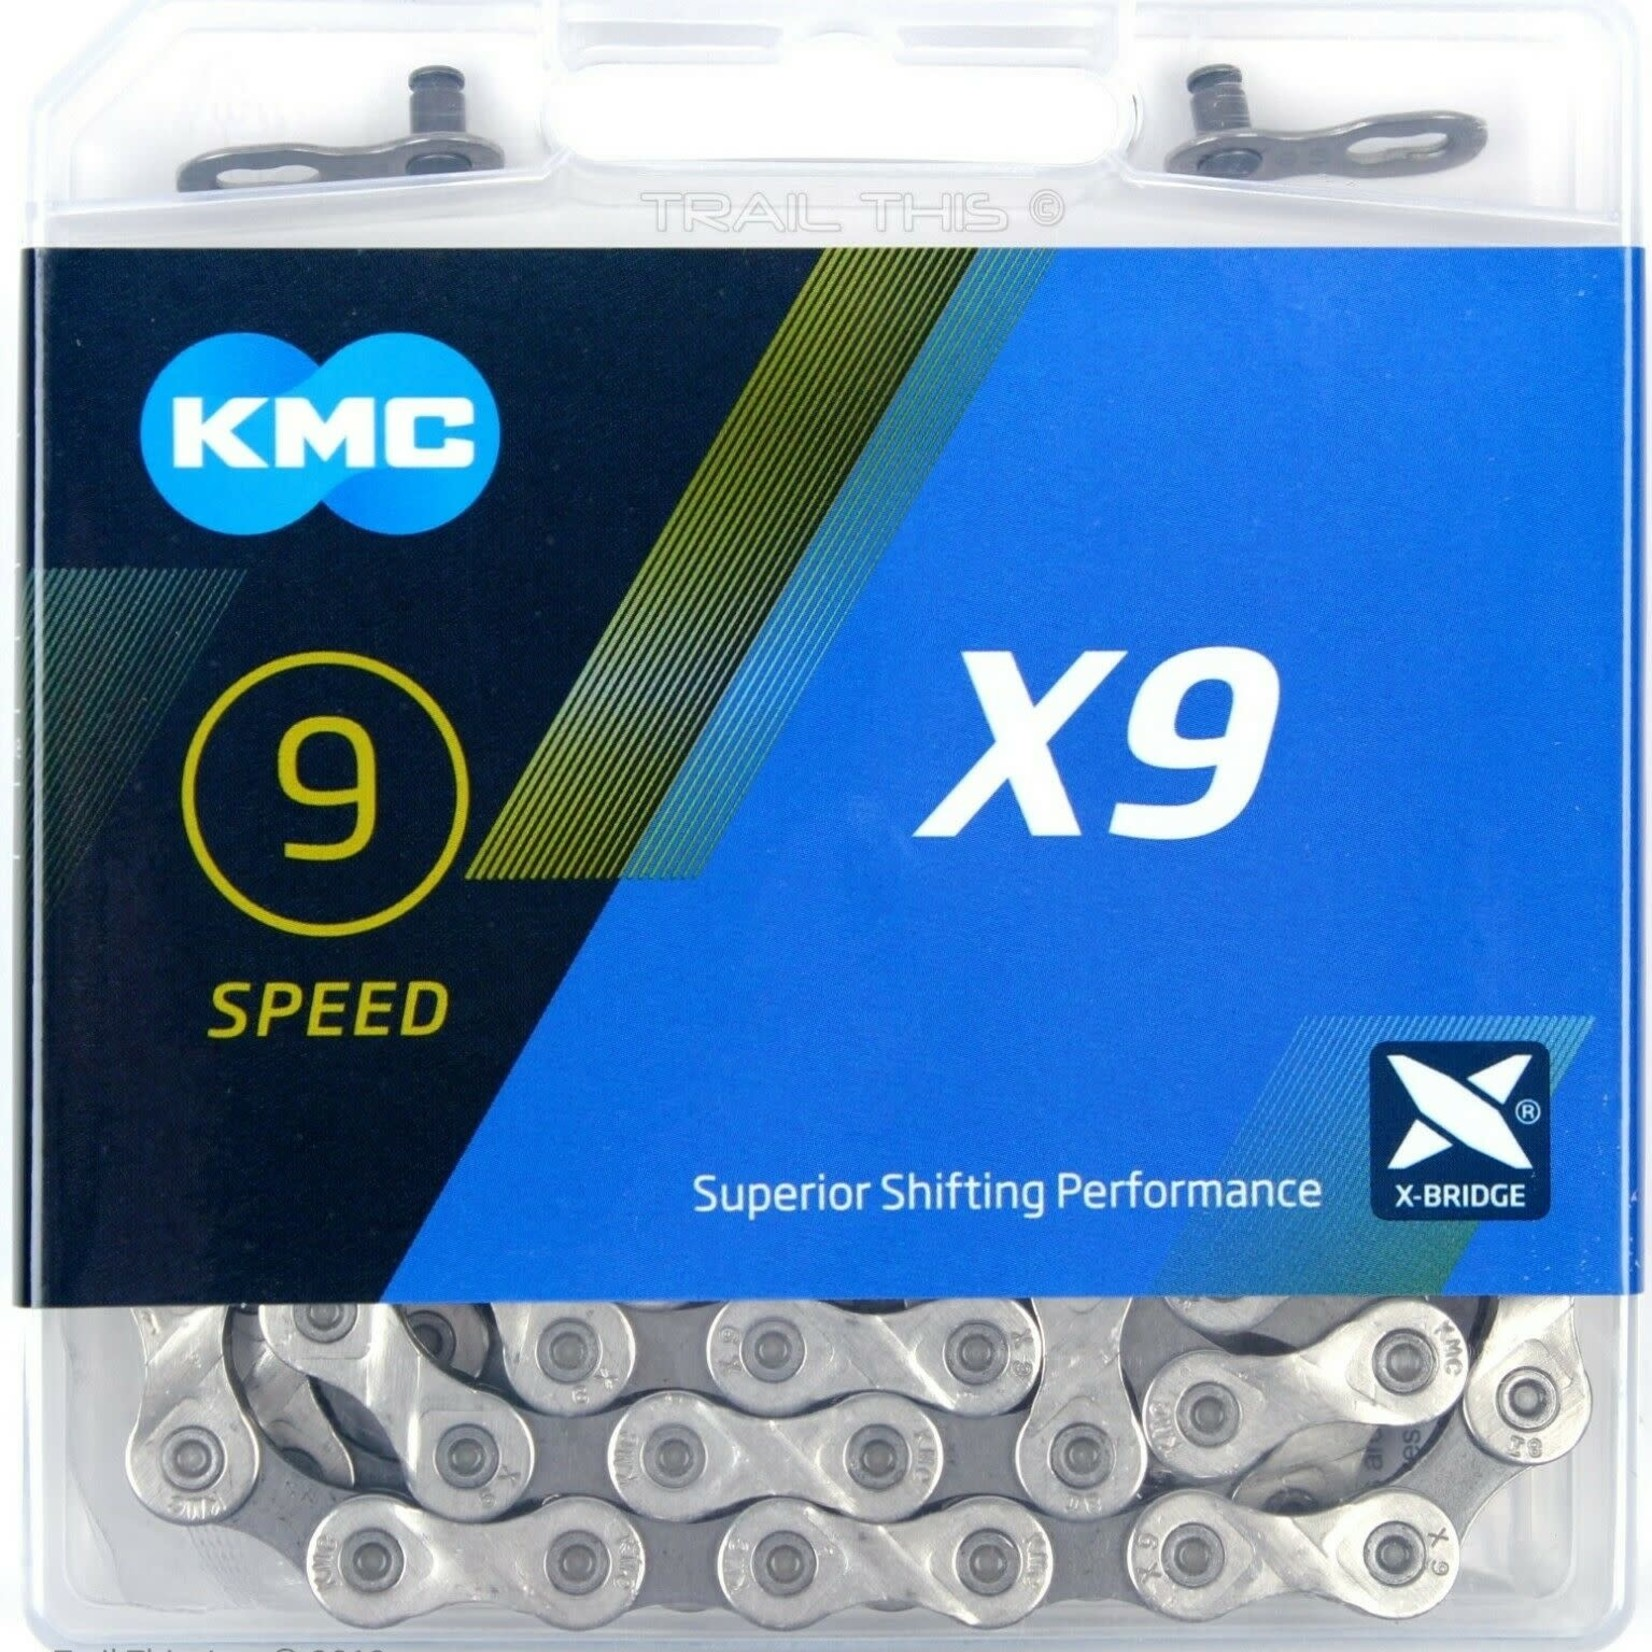 KMC KMC X9.93 Chain - 9-Speed, 116 Links, Silver/Gray